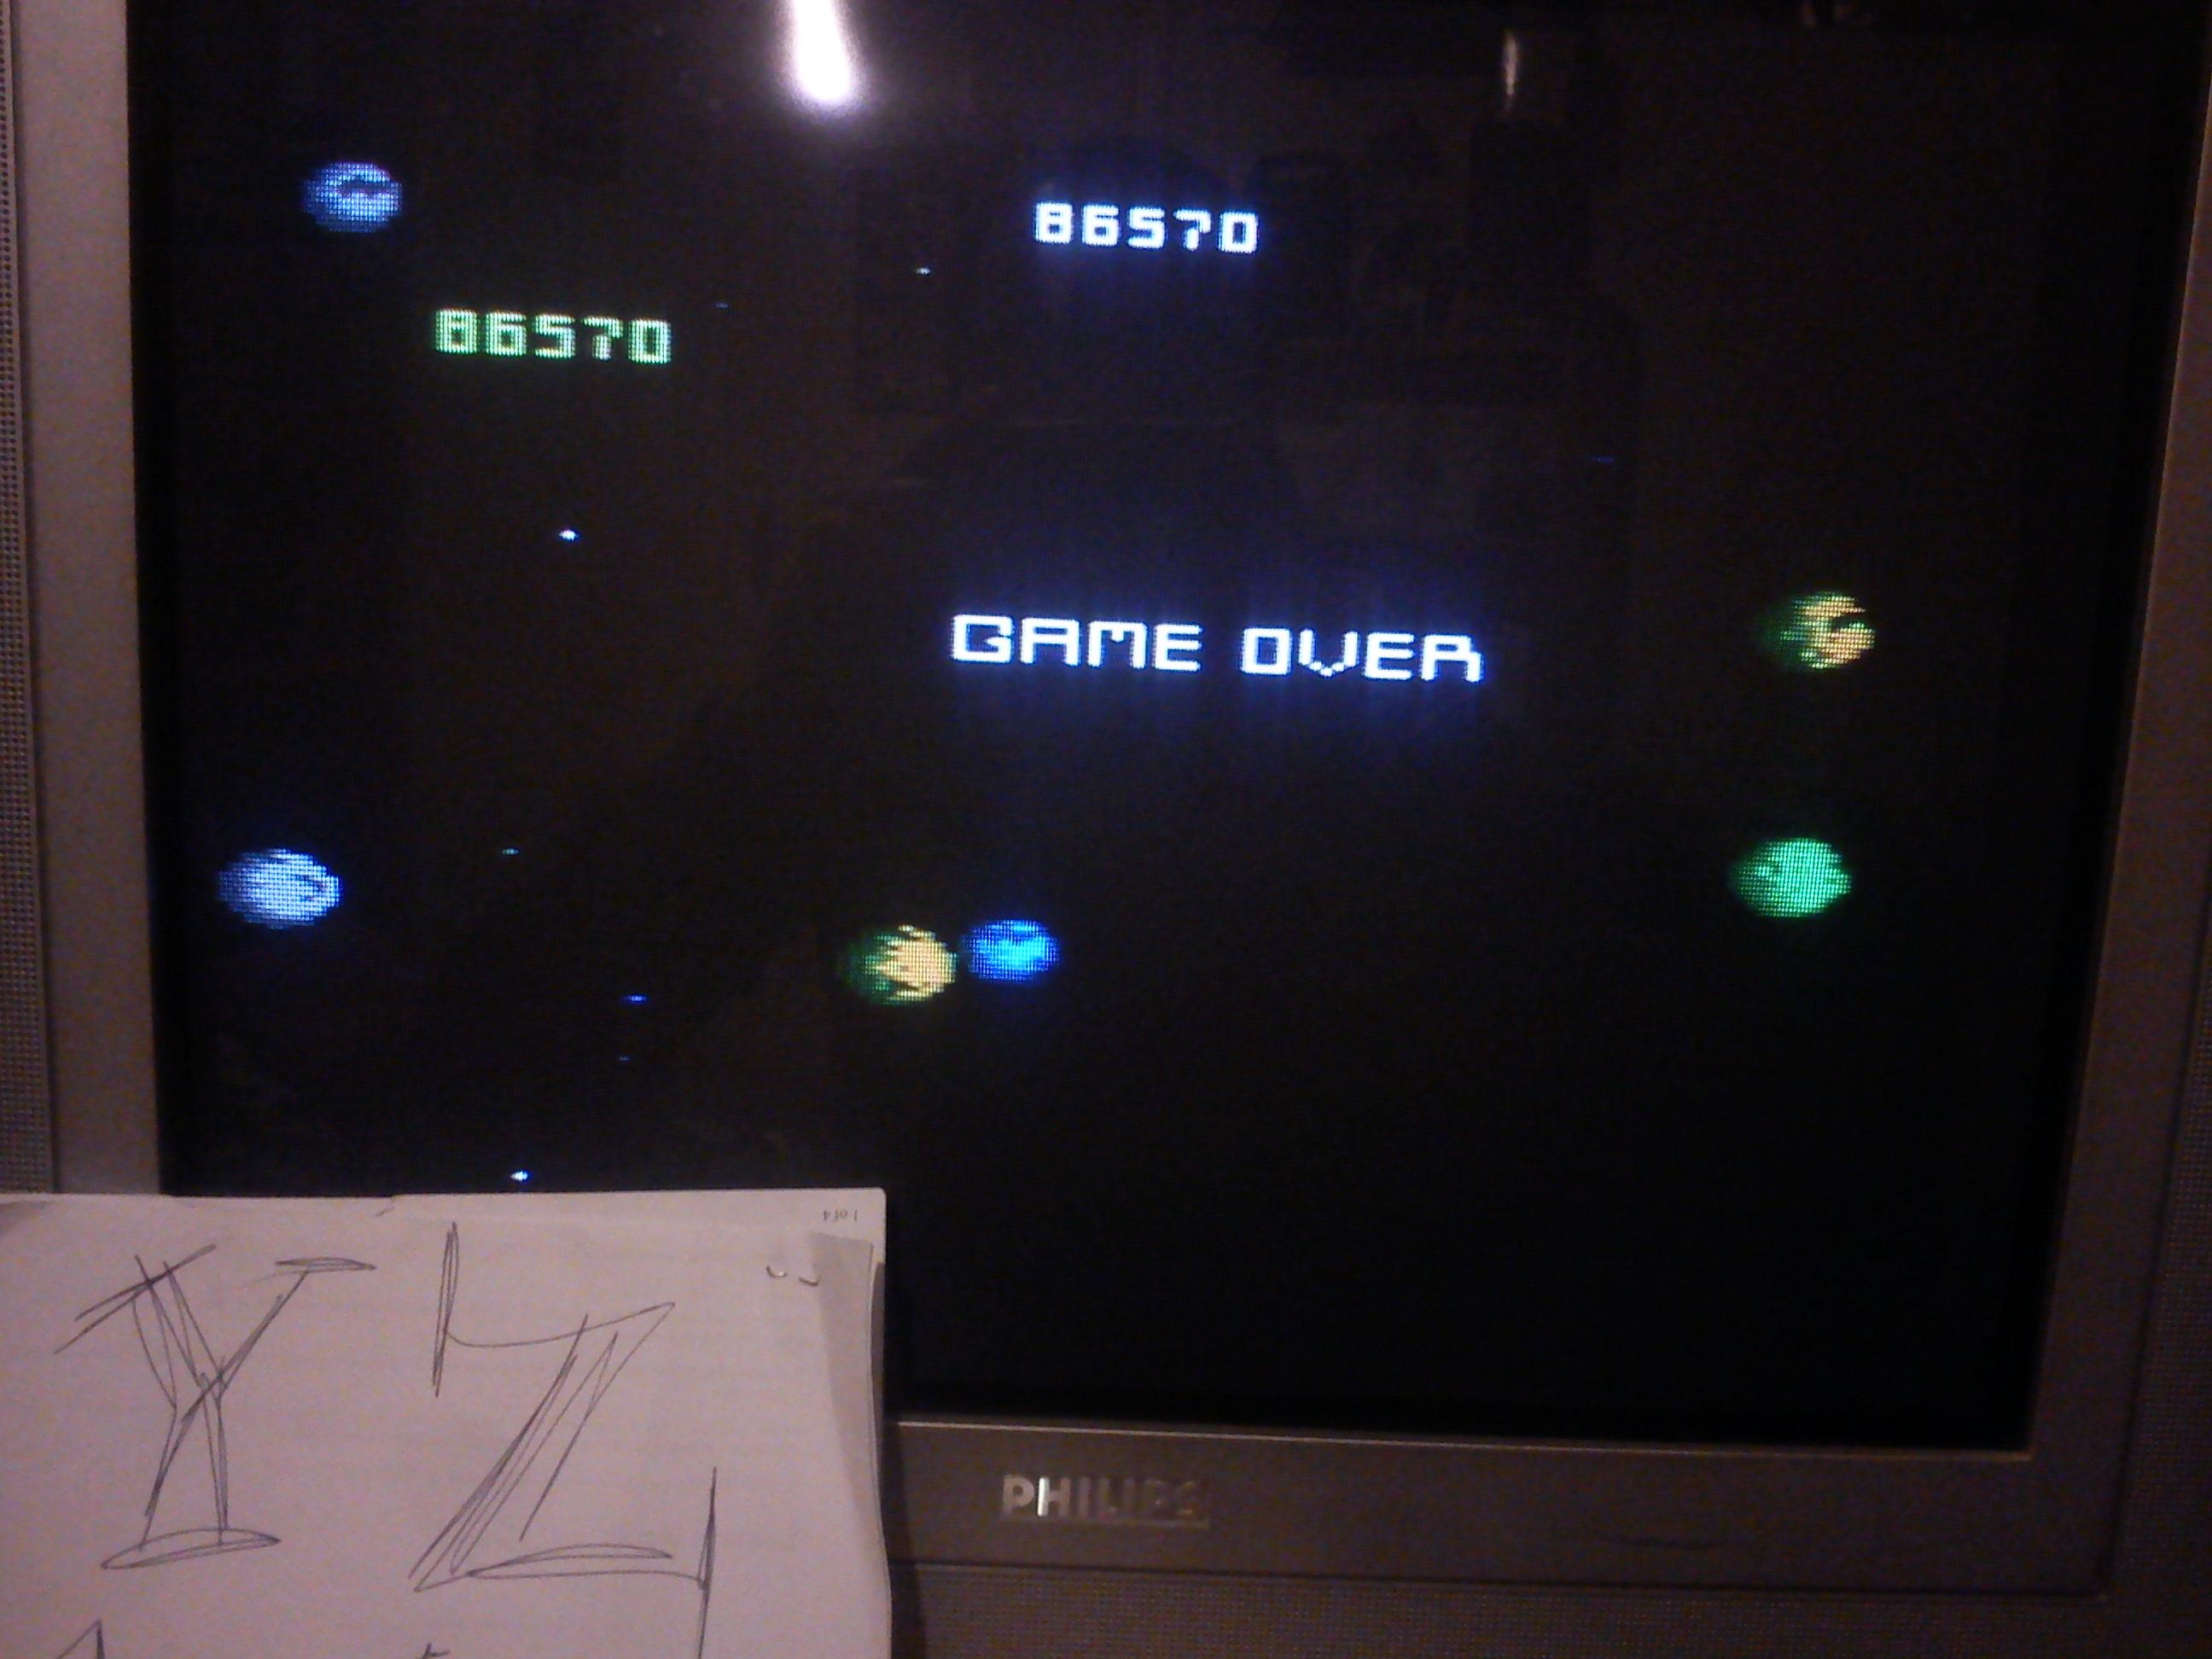 Fr0st: Asteroids: Novice (Atari 7800) 86,570 points on 2014-11-12 12:22:43